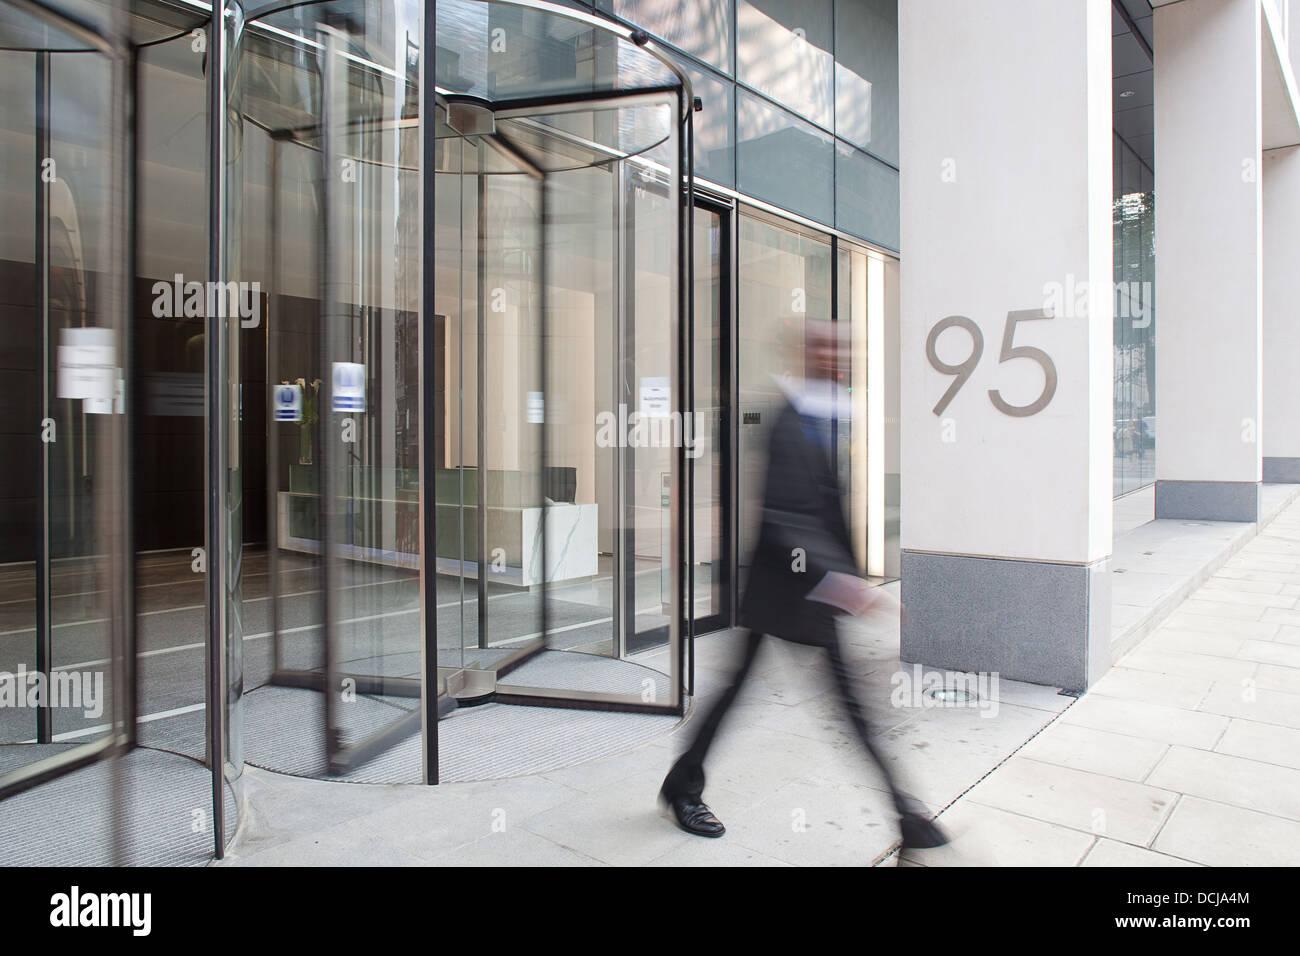 Office rotating doorway - Stock Image